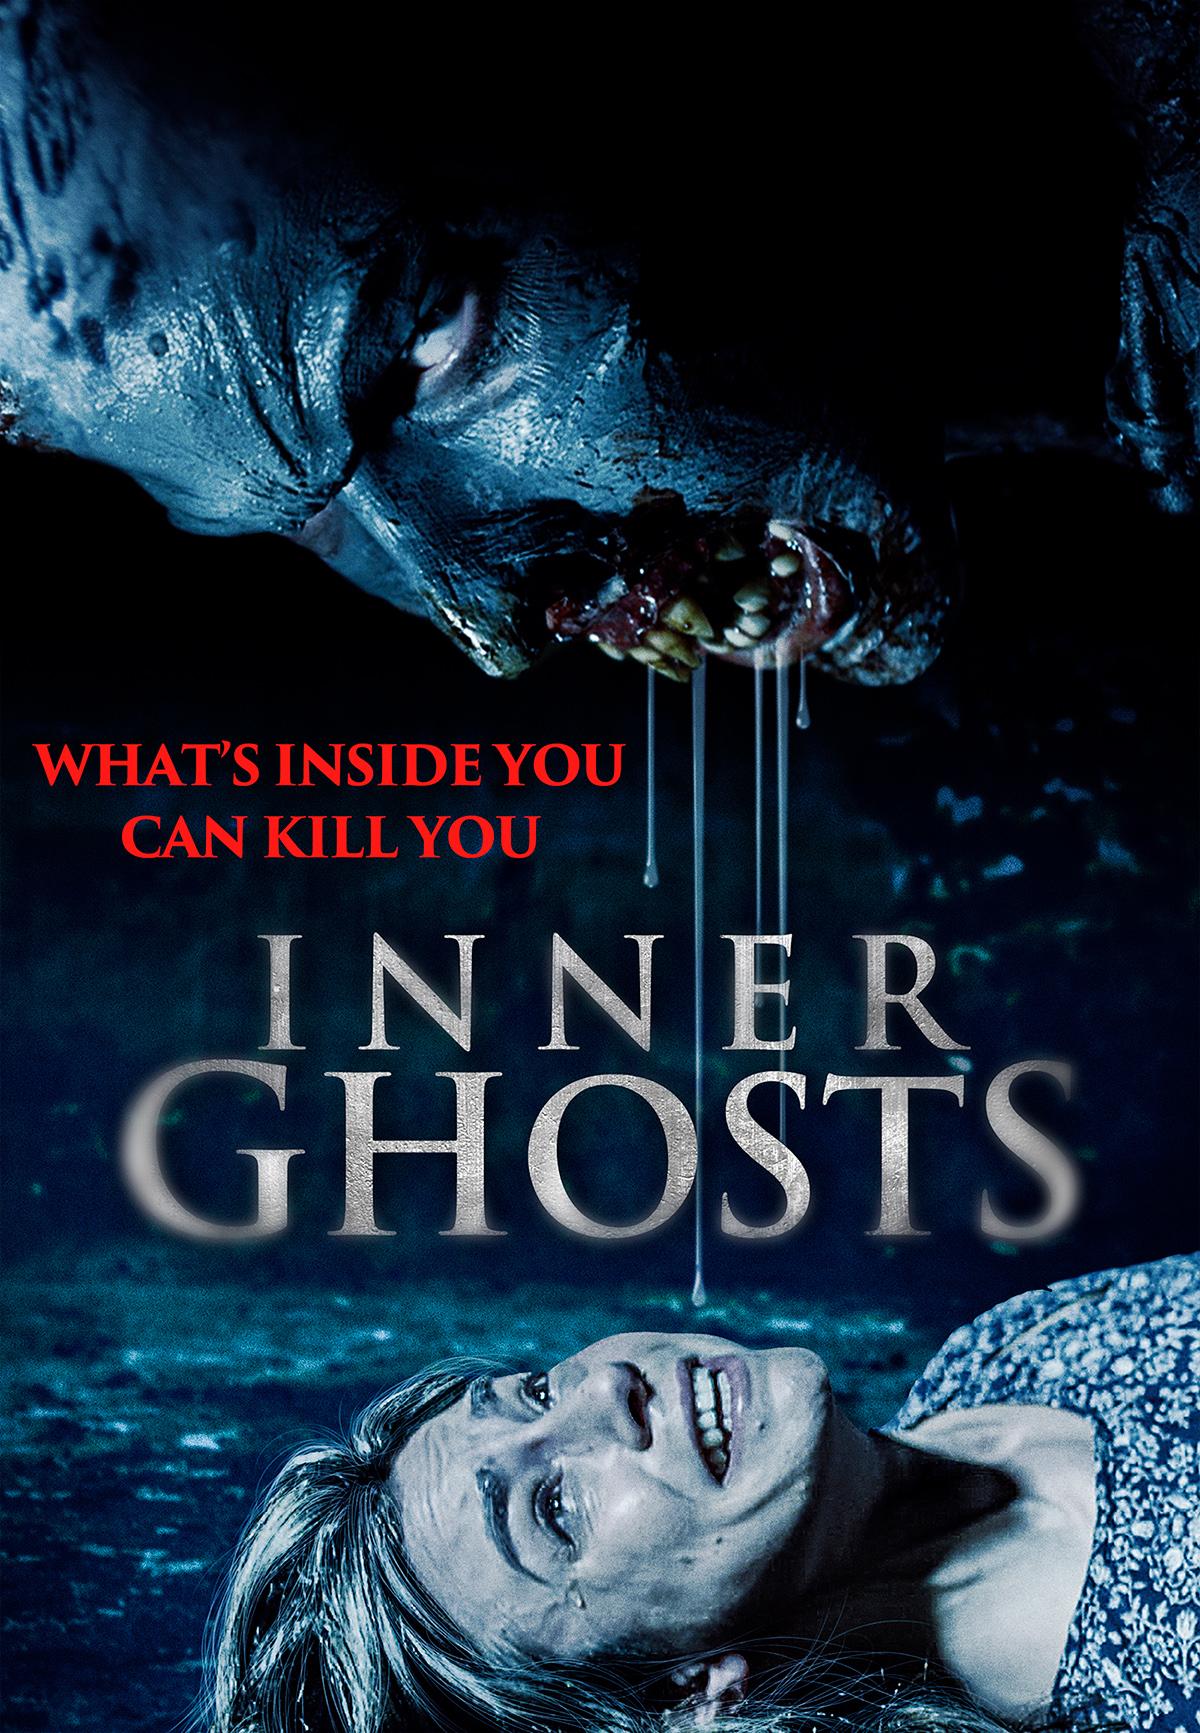 Inner Ghosts - Key Art